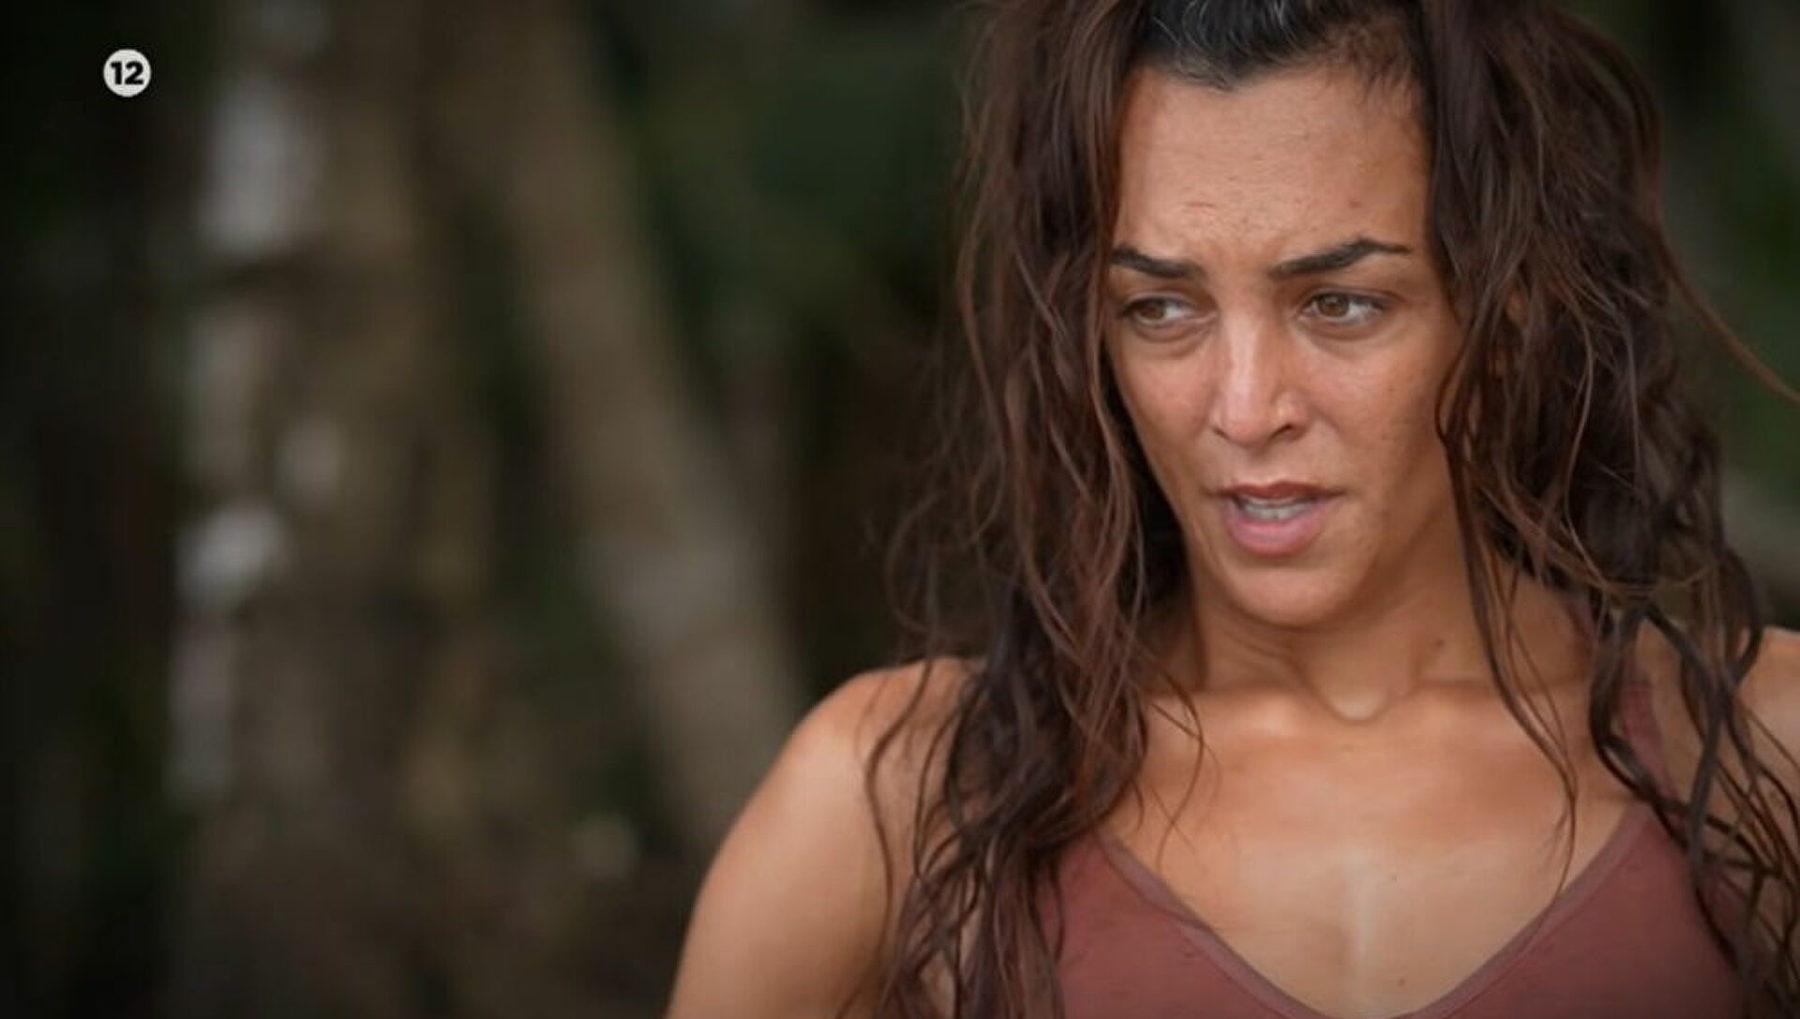 Survivor 4 - Καρολίνα Καλύβα: «Αν μου το έλεγε εμένα αυτό ο Τριαντάφυλλος, μπορεί να τον είχα στραγγαλίσει εκείνη την ώρα, να τον έθαβα μέσα στη γη να ισιώσει»